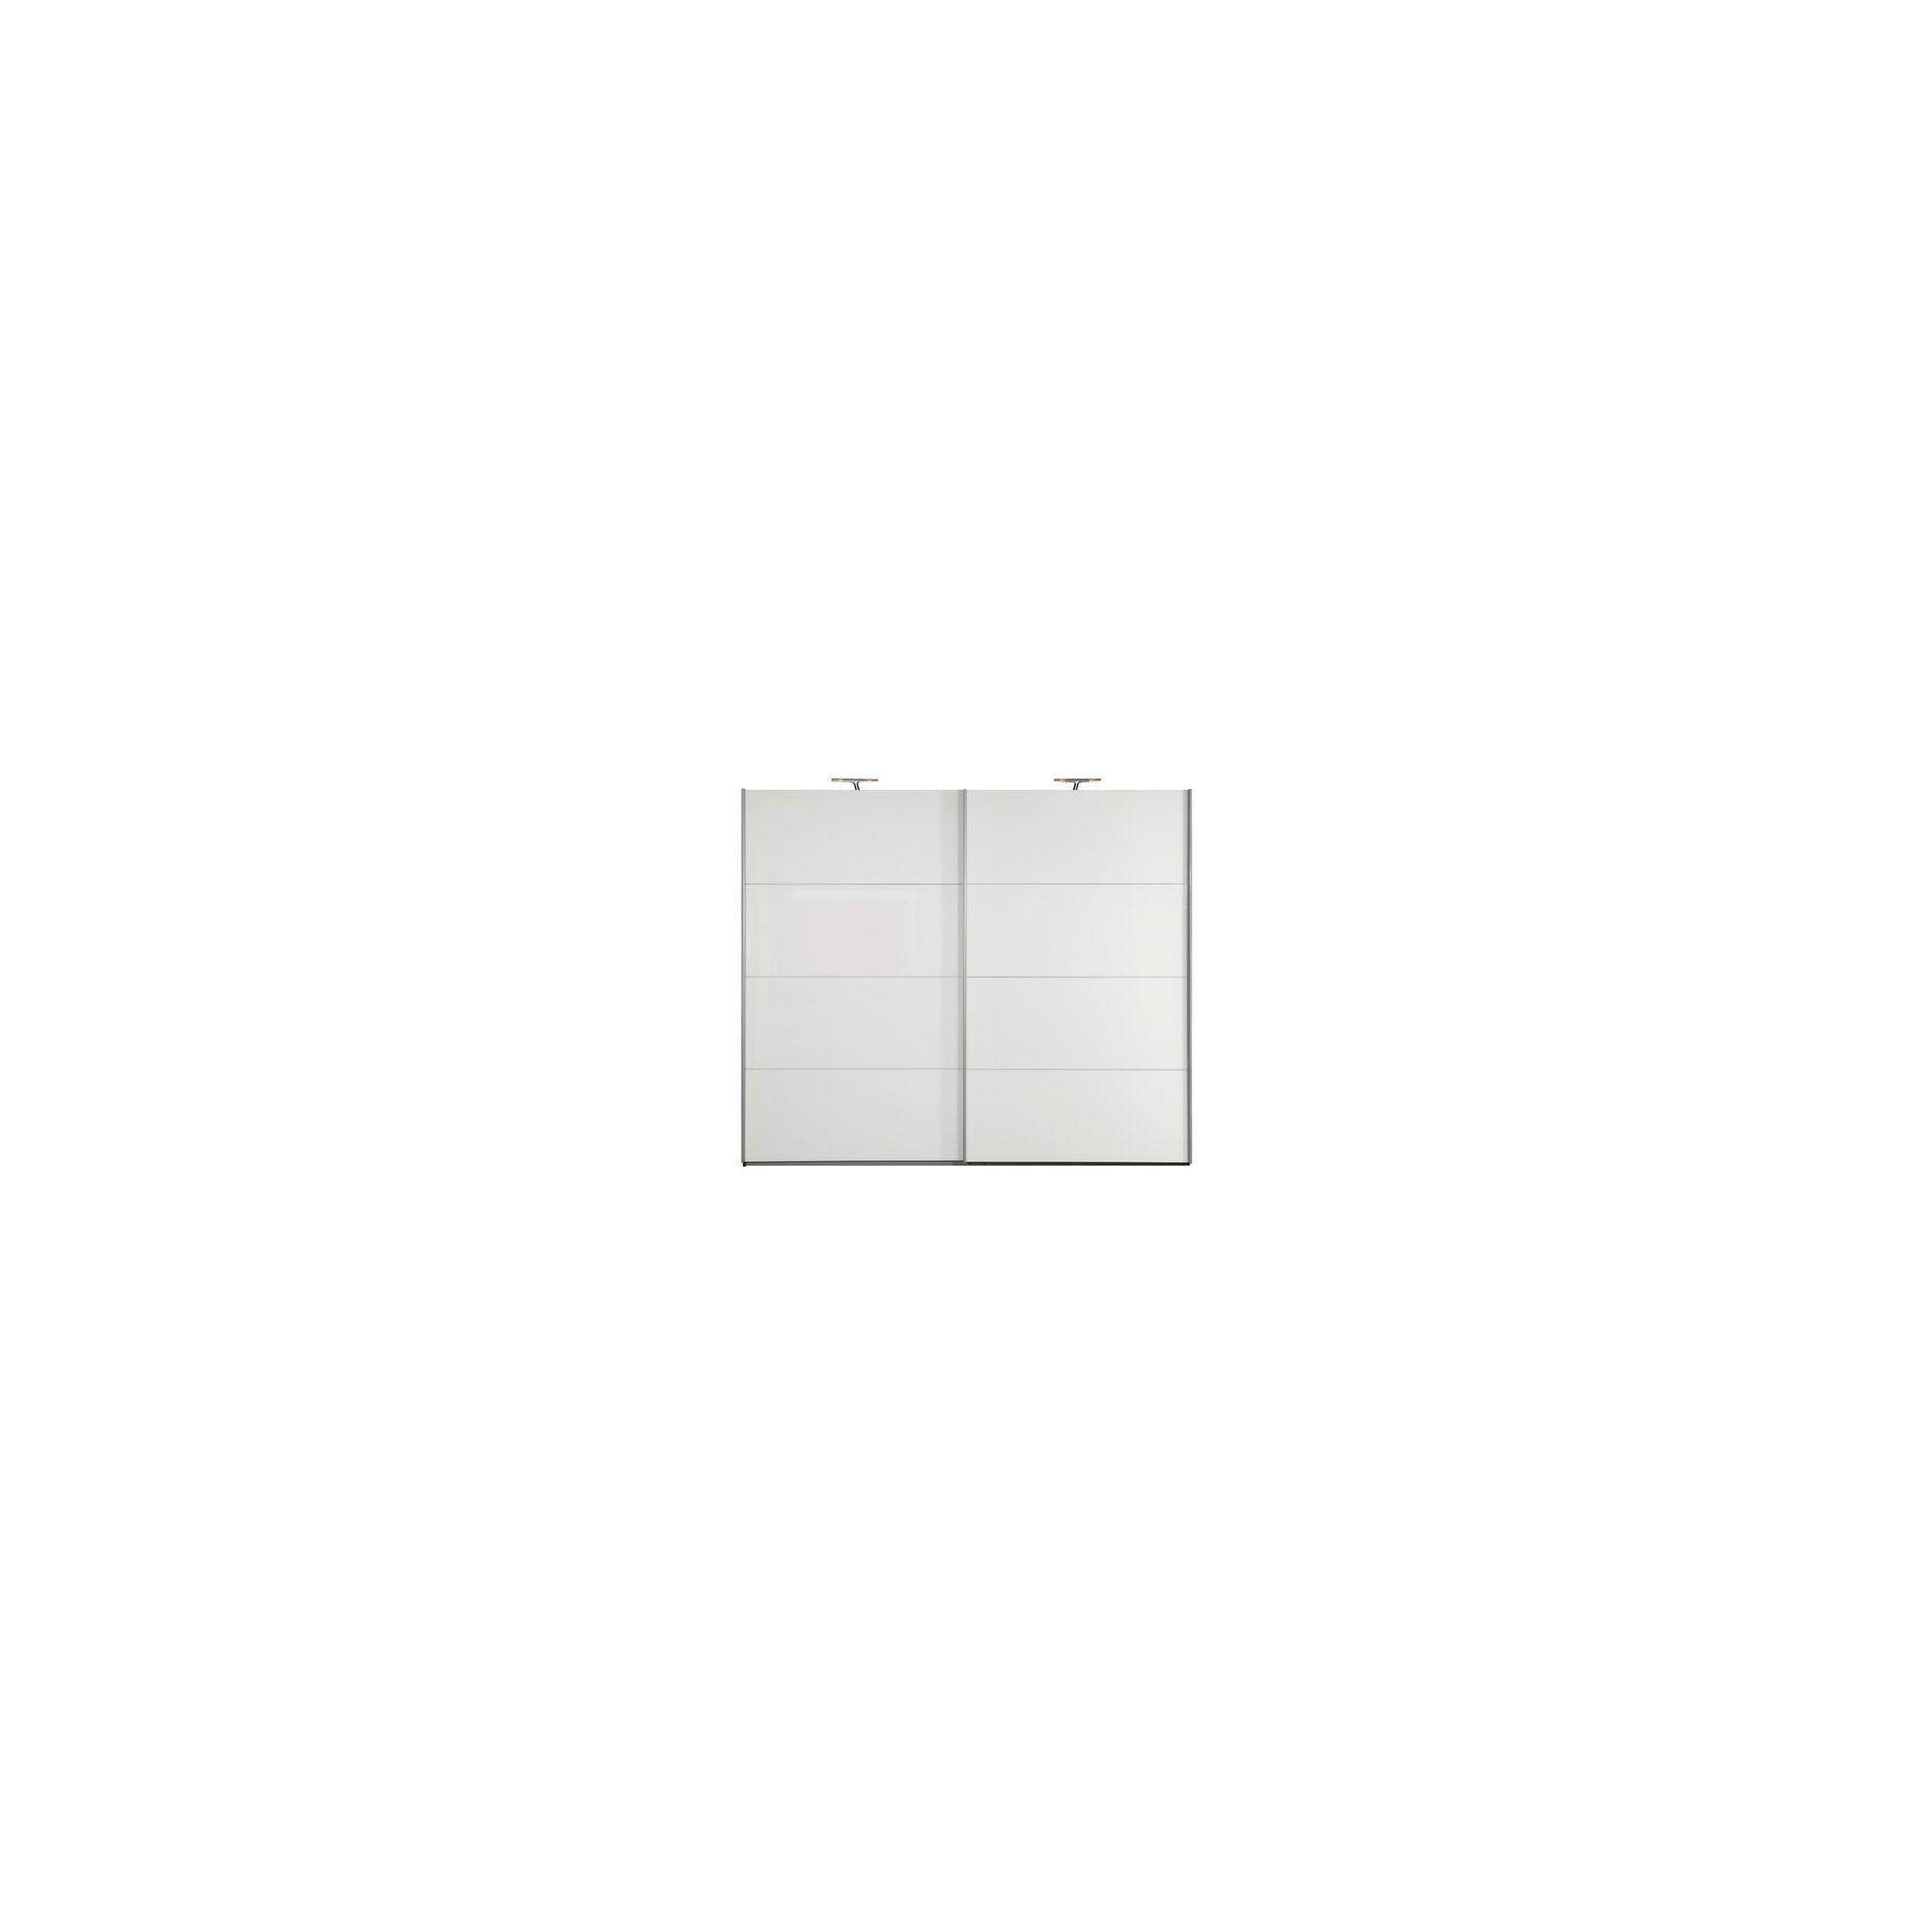 Arte-M Kick Sliding Door Wardrobe - 252cm at Tesco Direct